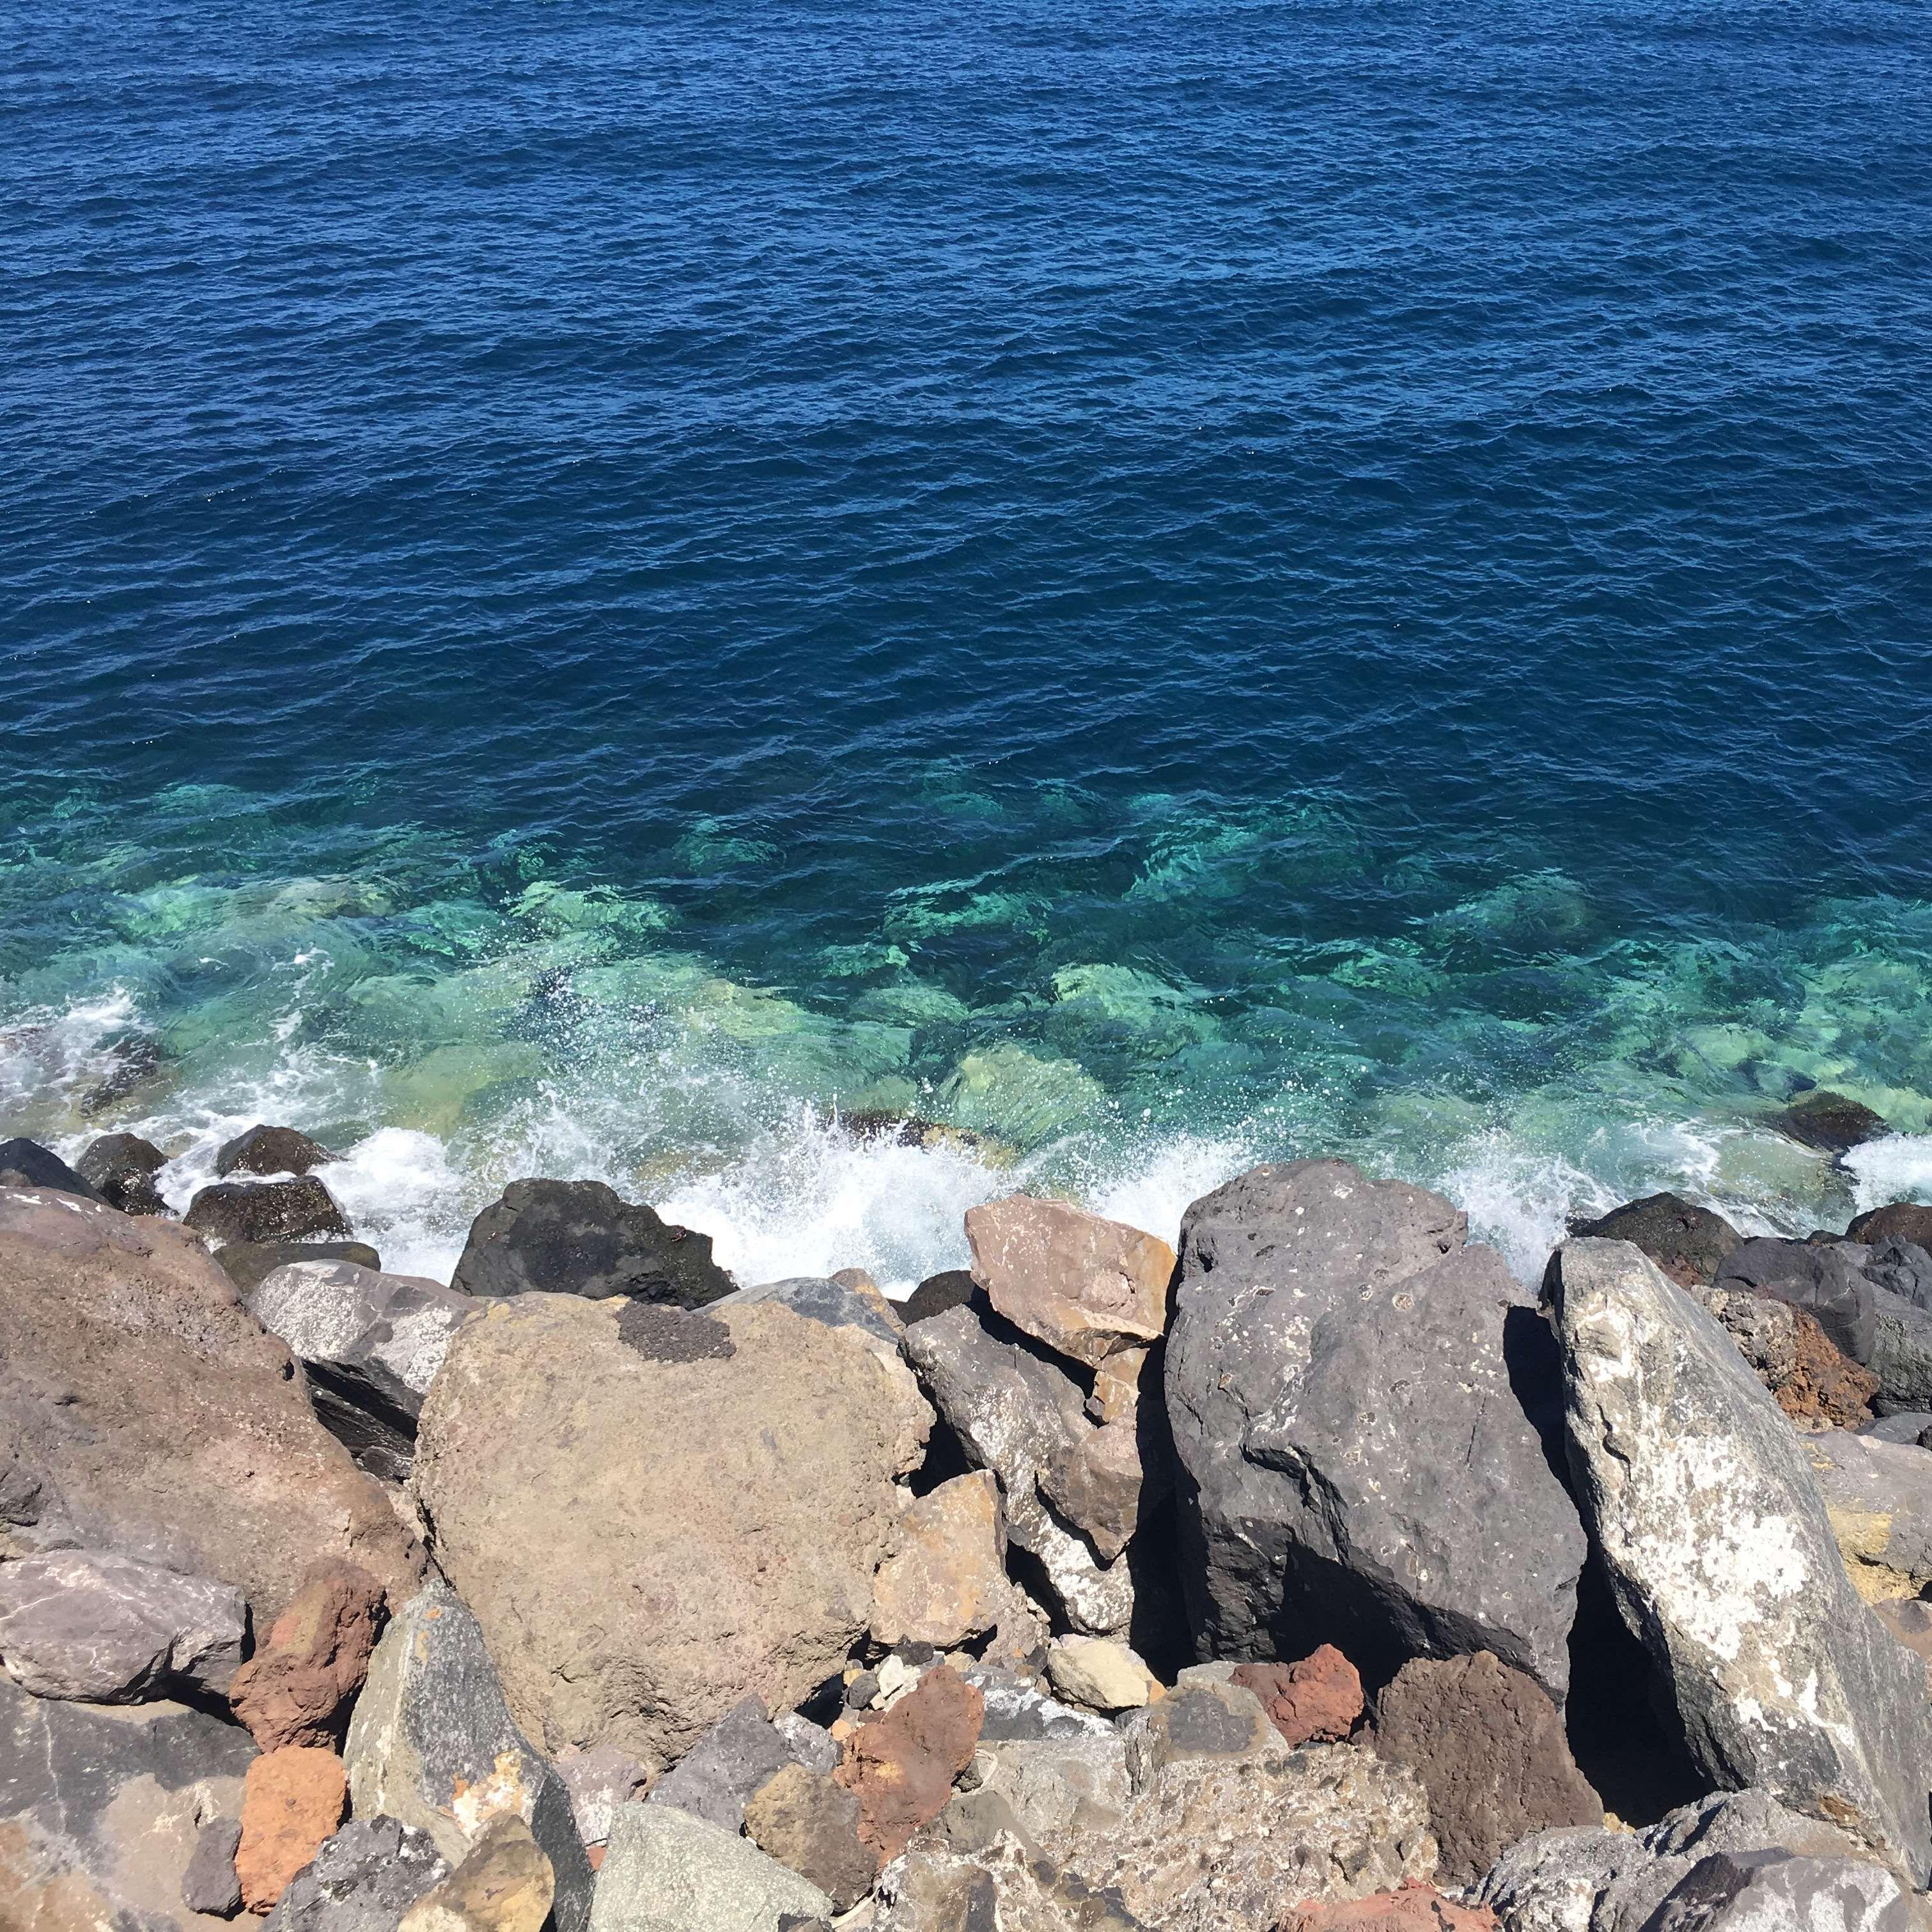 Blue Landscape Ocean Photography Rocks Sea Landscape Ocean Photography Ocean